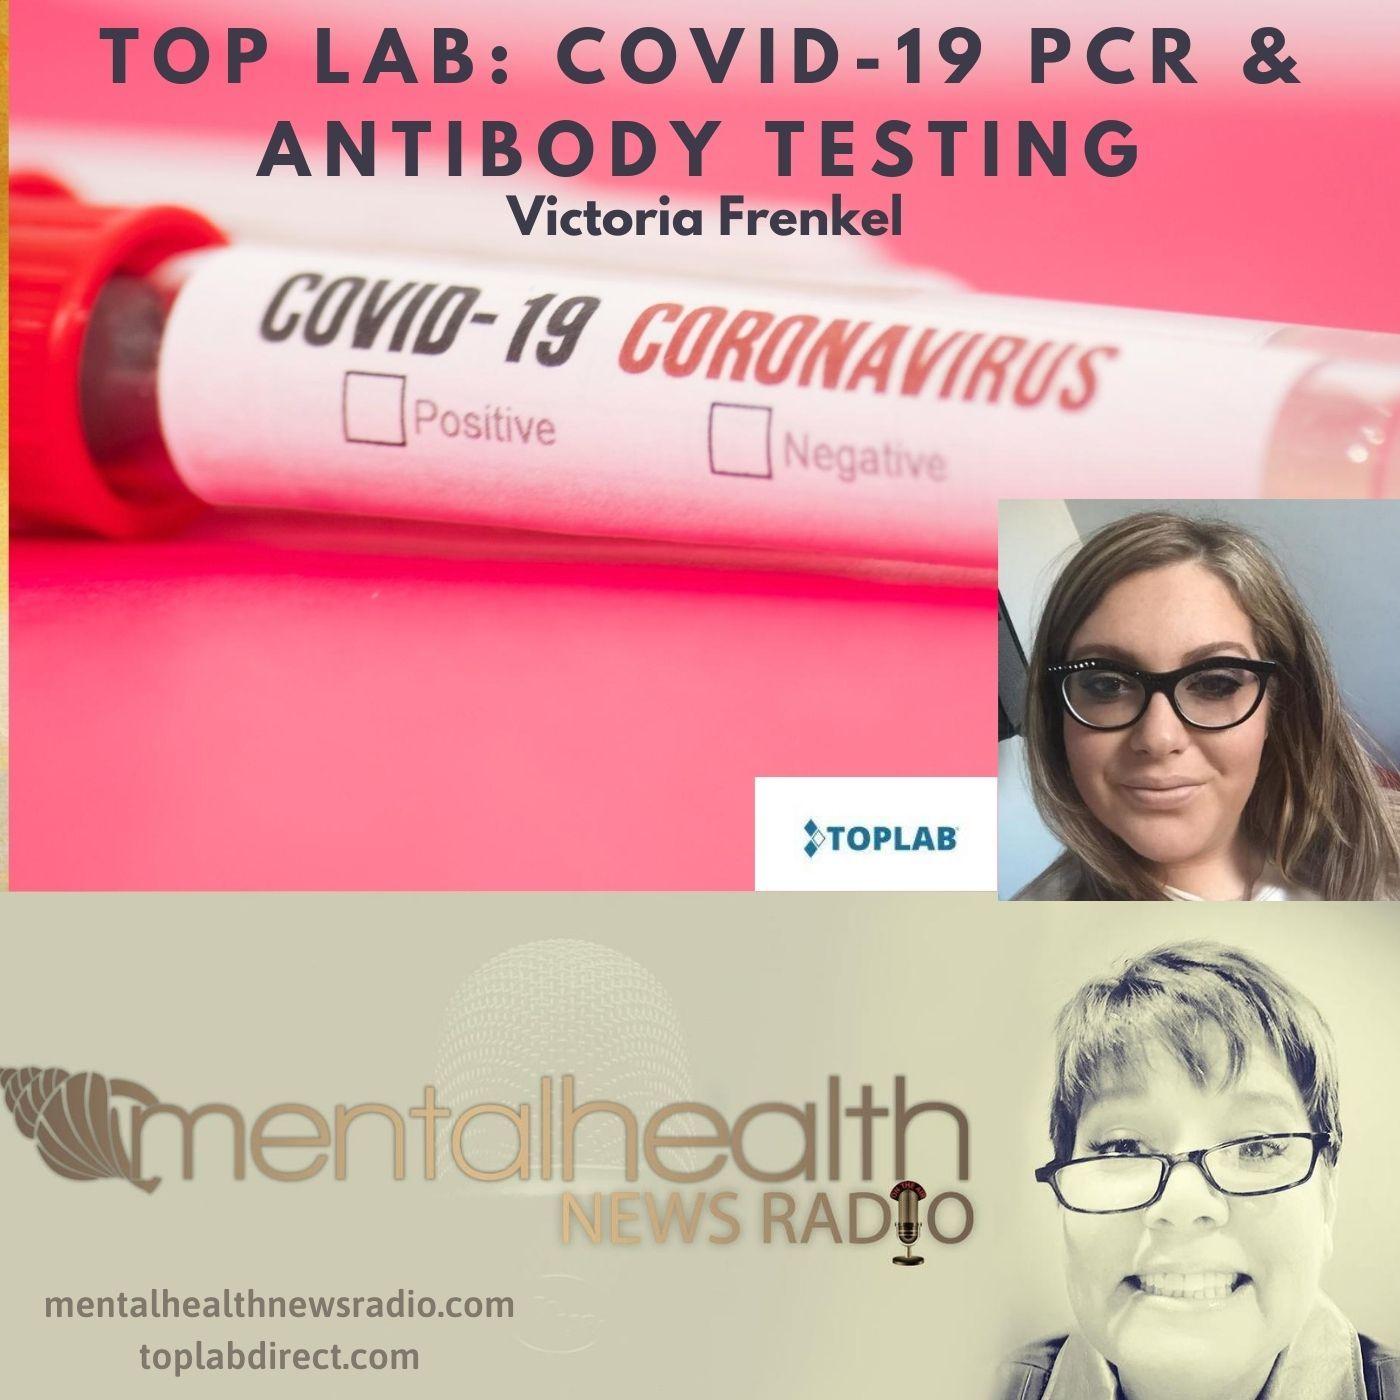 Mental Health News Radio - Top Lab: Covid-19 PCR and Antibody Testing